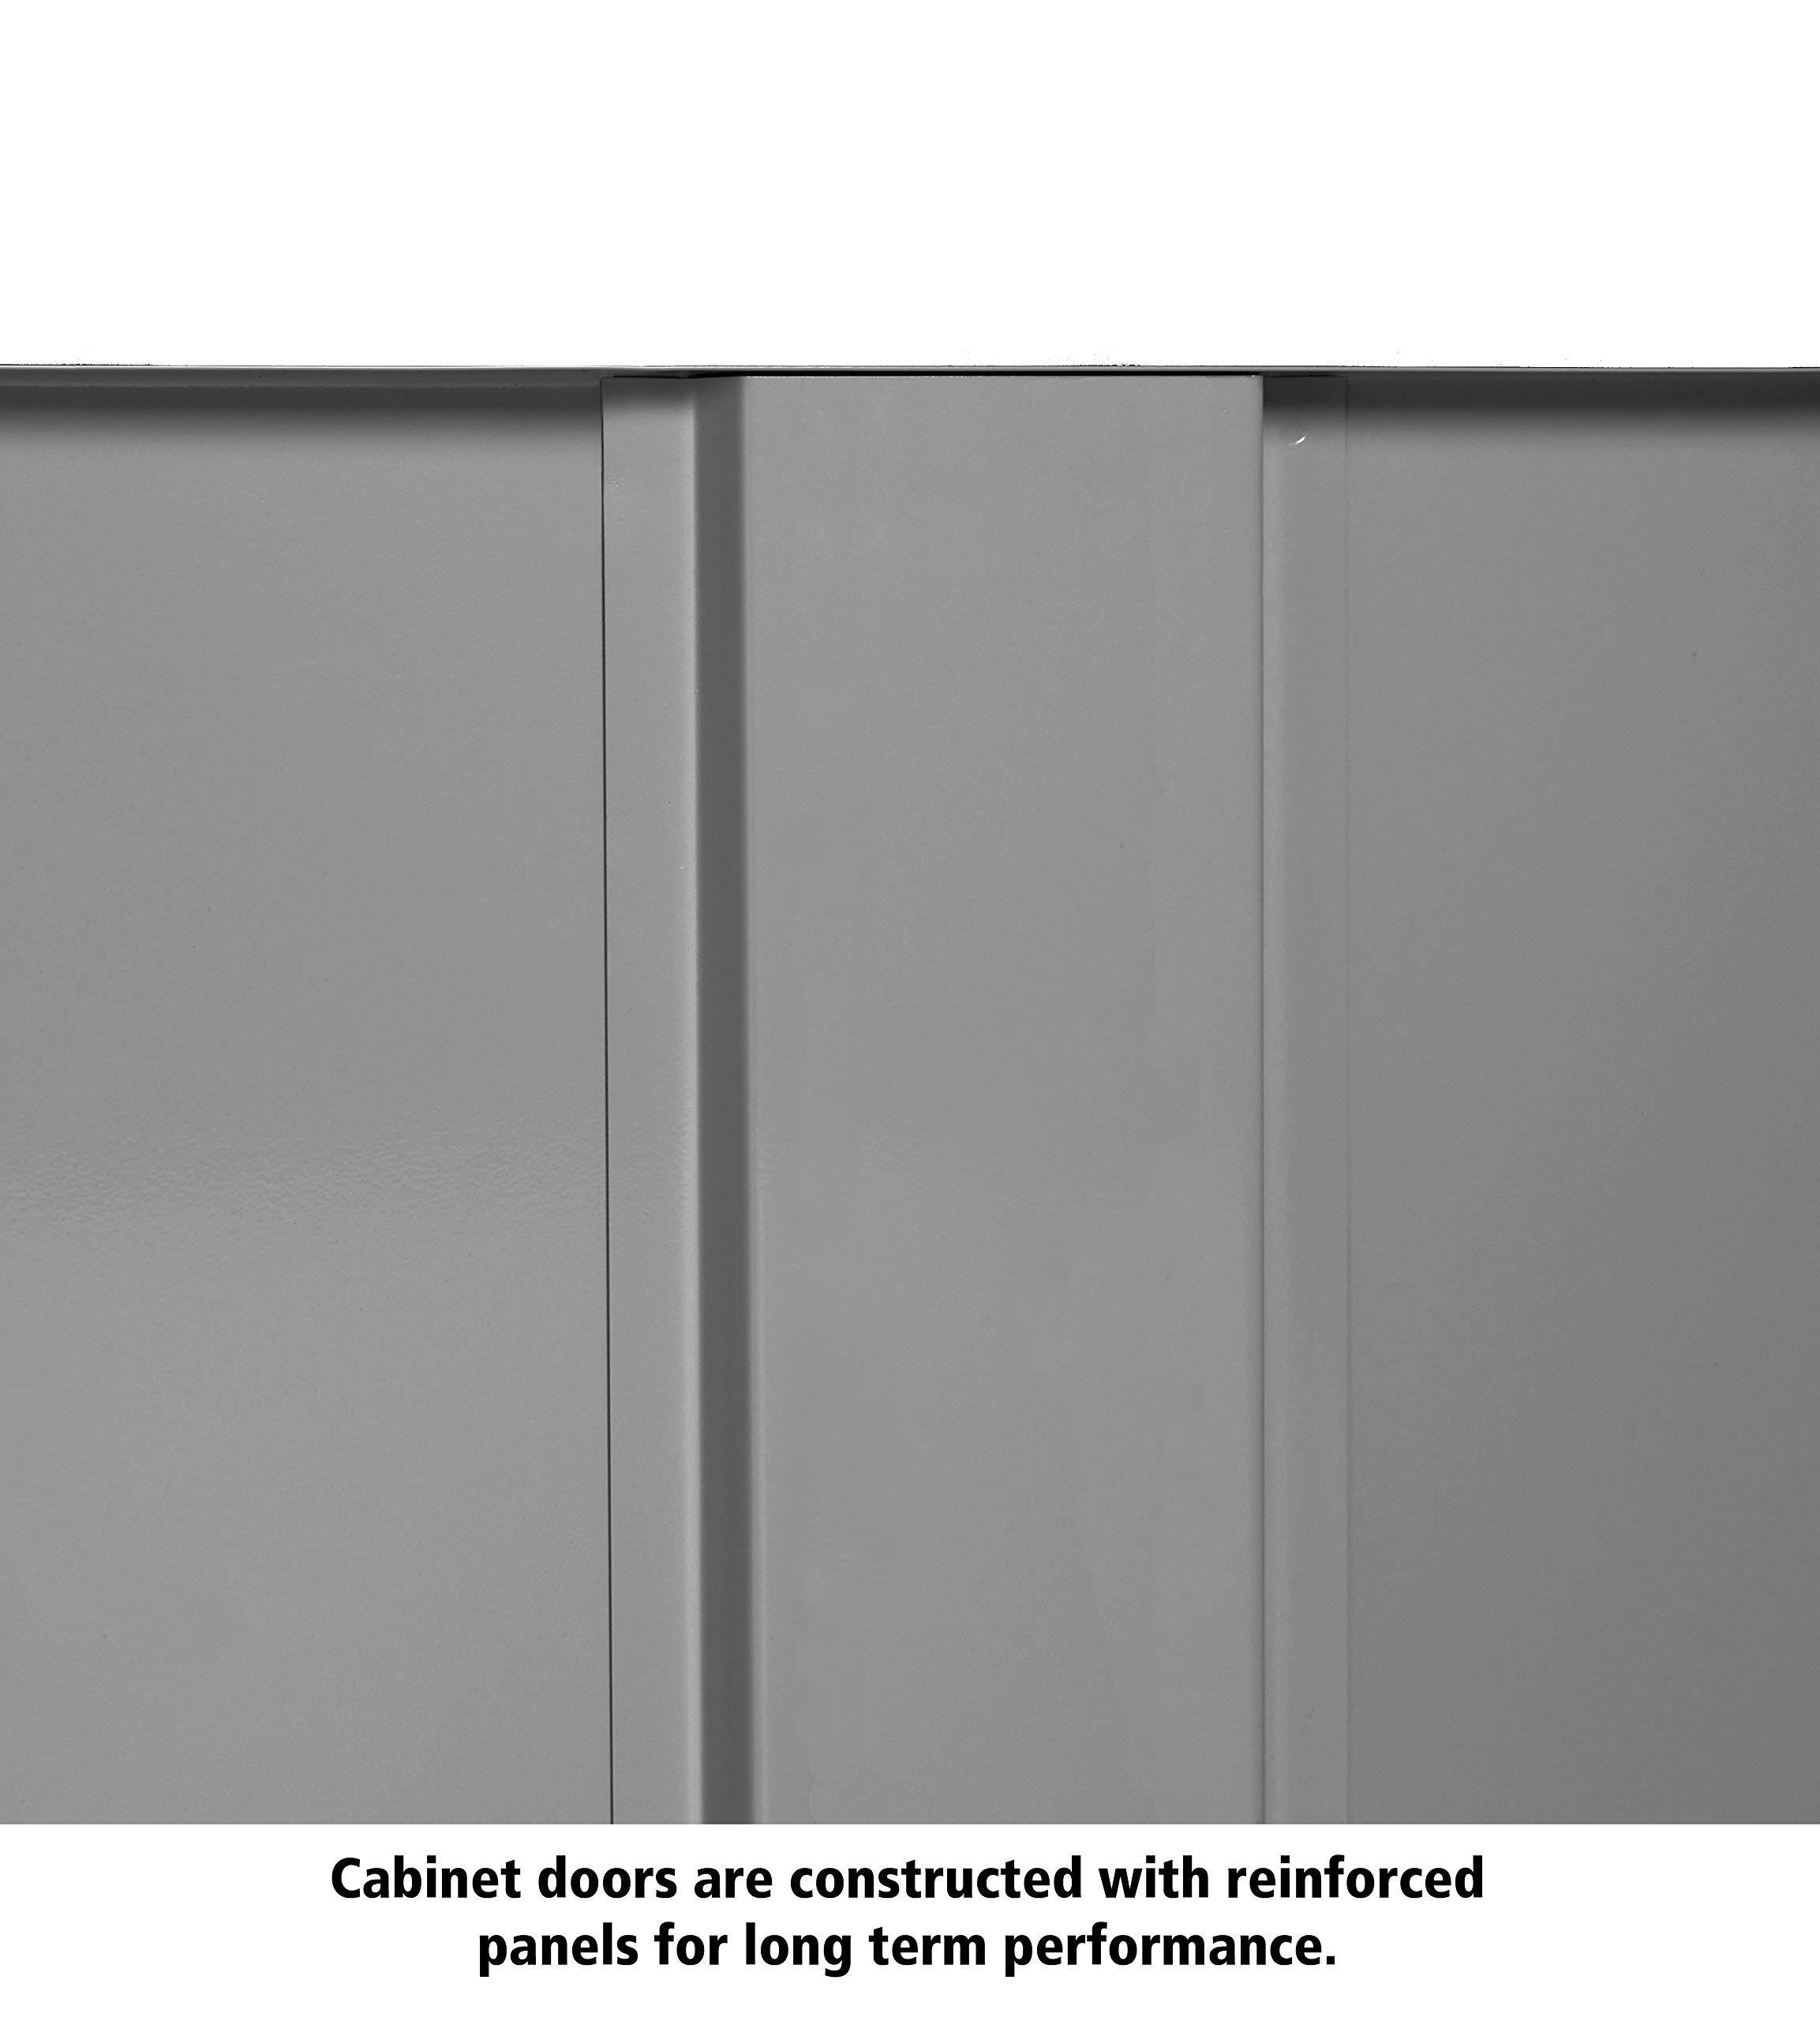 Tennsco 4218 24 Gauge Steel Standard Welded Counter High Cabinet, 2 Shelves, 150 lbs Capacity per Shelf, 36'' Width x 42'' Height x 18'' Depth, Black (Renewed) by Tennsco (Image #4)